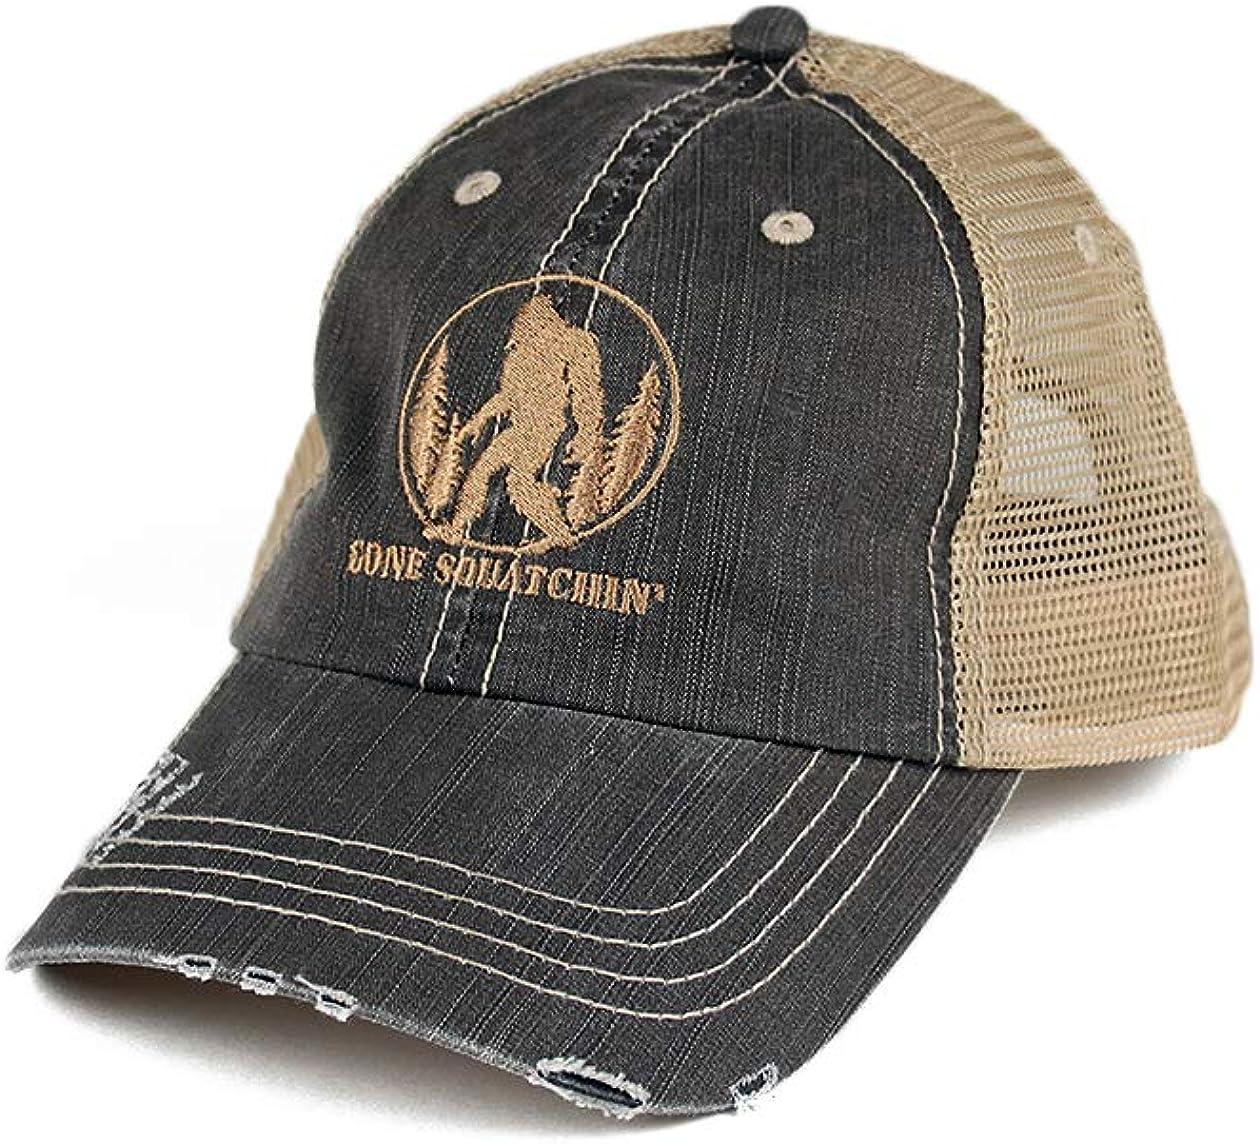 B Wear Sportswear Gone Squatchin' Twill Cotton Brow quality assurance Cap Trucker Award-winning store